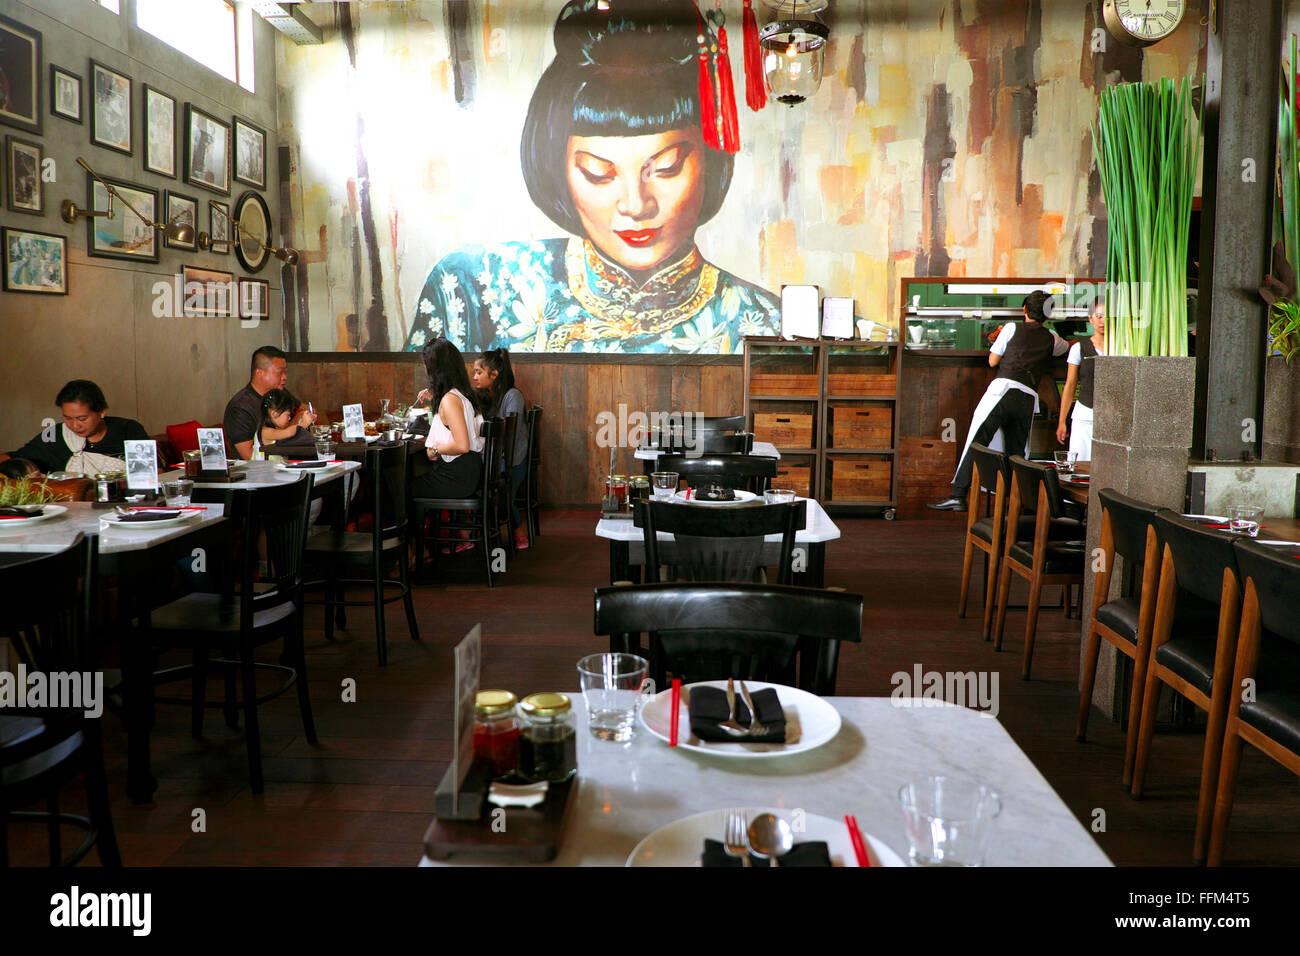 Mama San restaurant interior, Seminyak, Bali - Stock Image